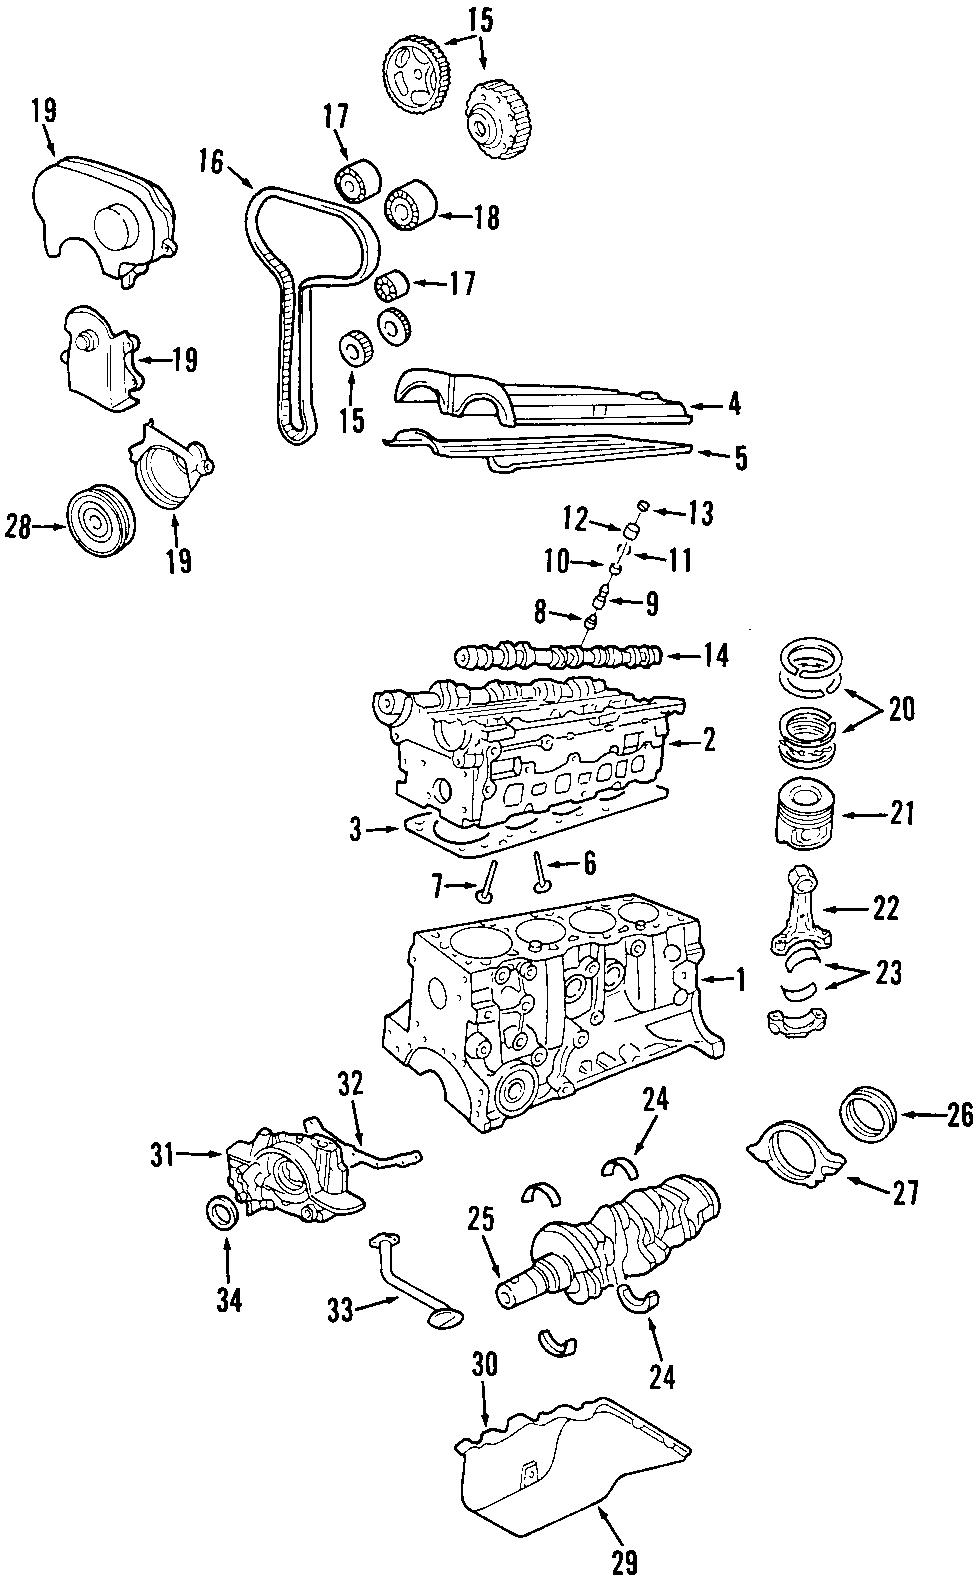 Ford Escort Crankshaft. Gear. Timing. Engine. Sprocket. 2